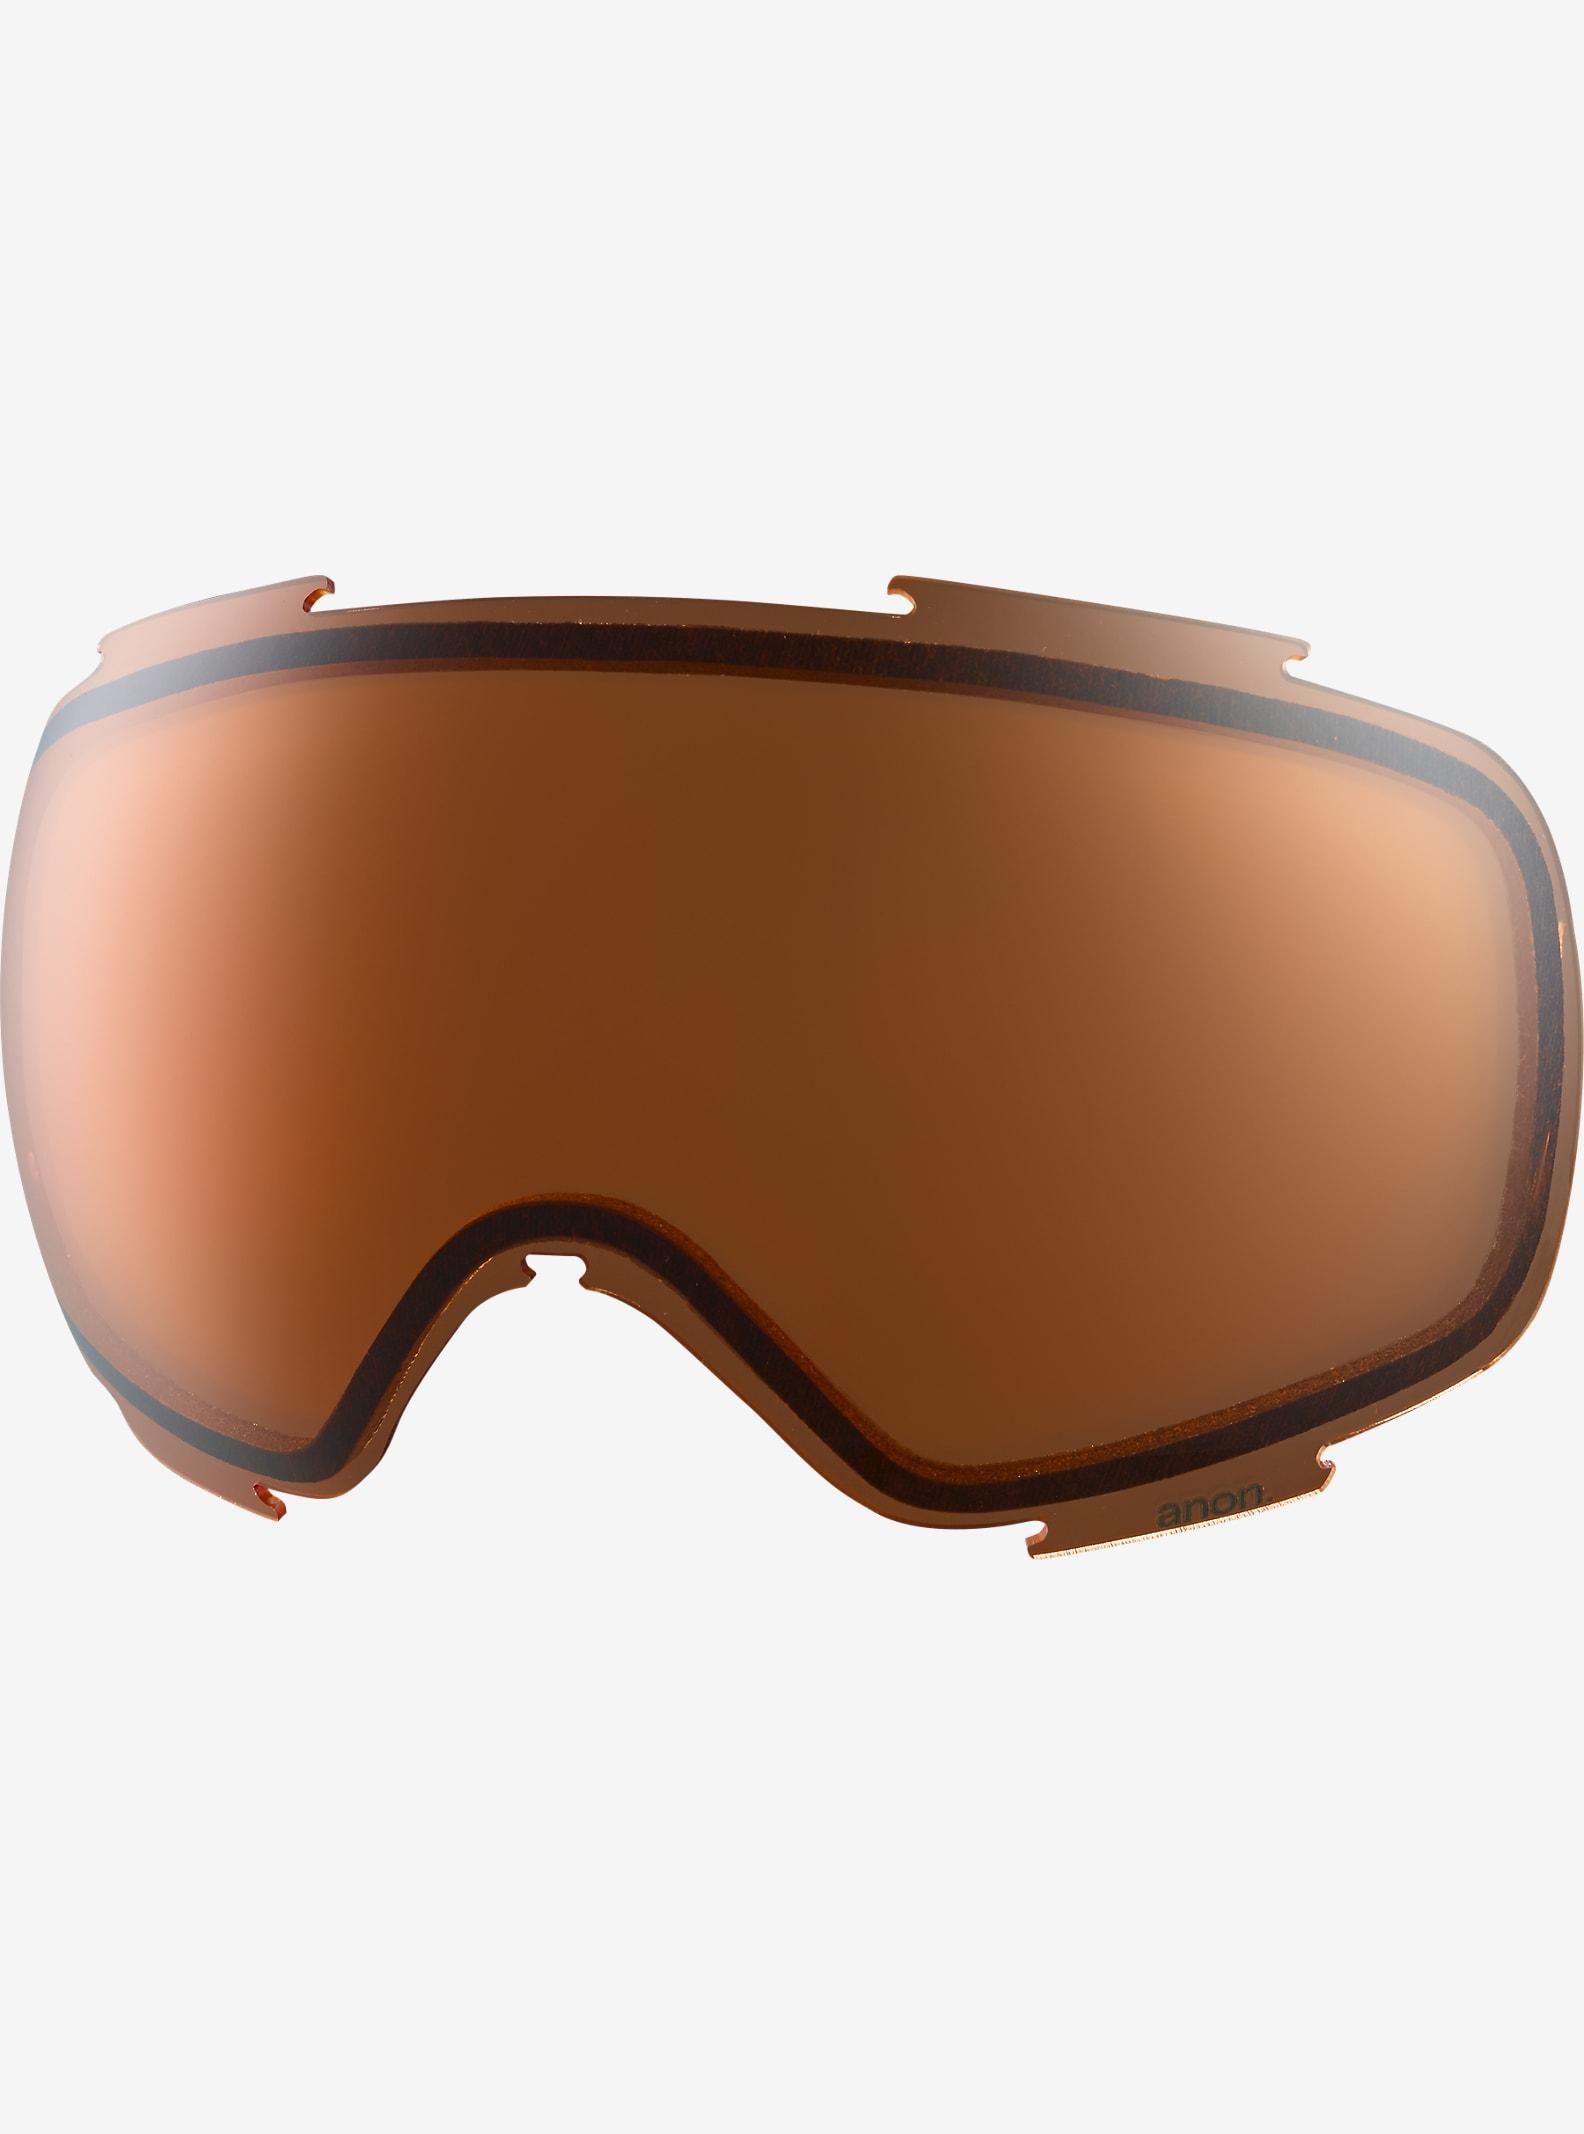 anon. Tempest Goggle Lens shown in Amber (55% VLT)